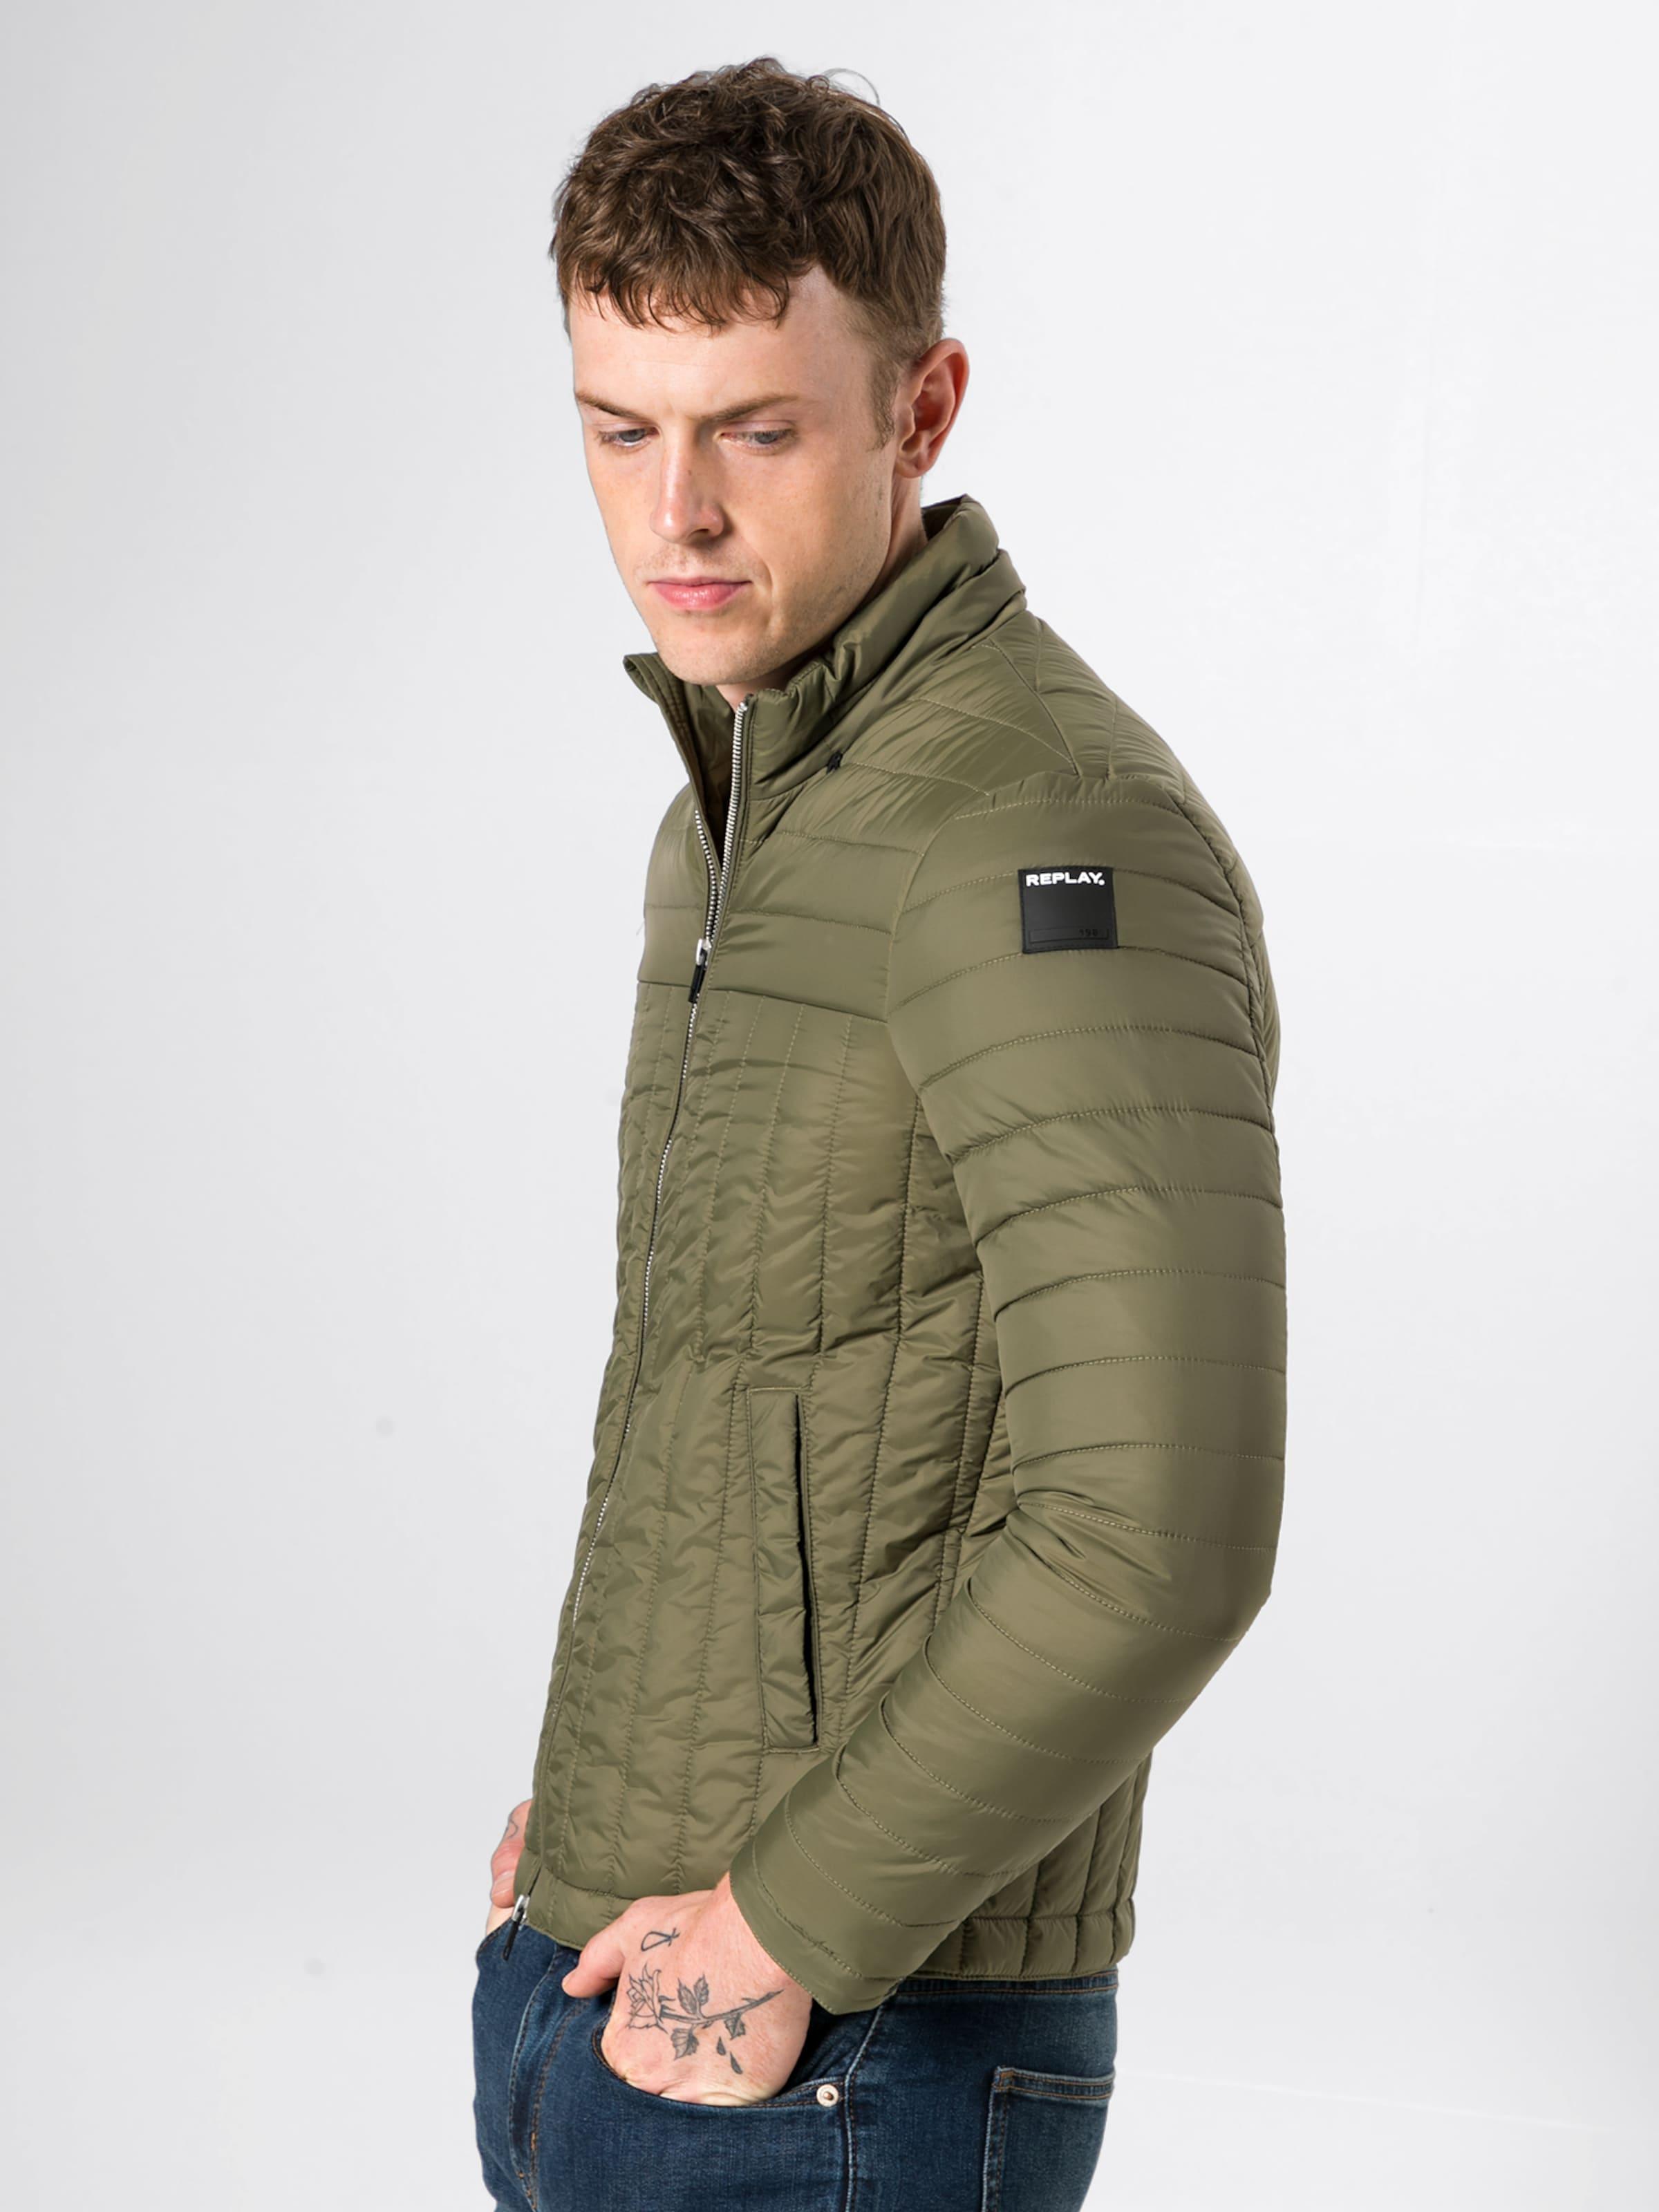 Mi 'jacket' En saison Replay Veste Noir dtQCshrx